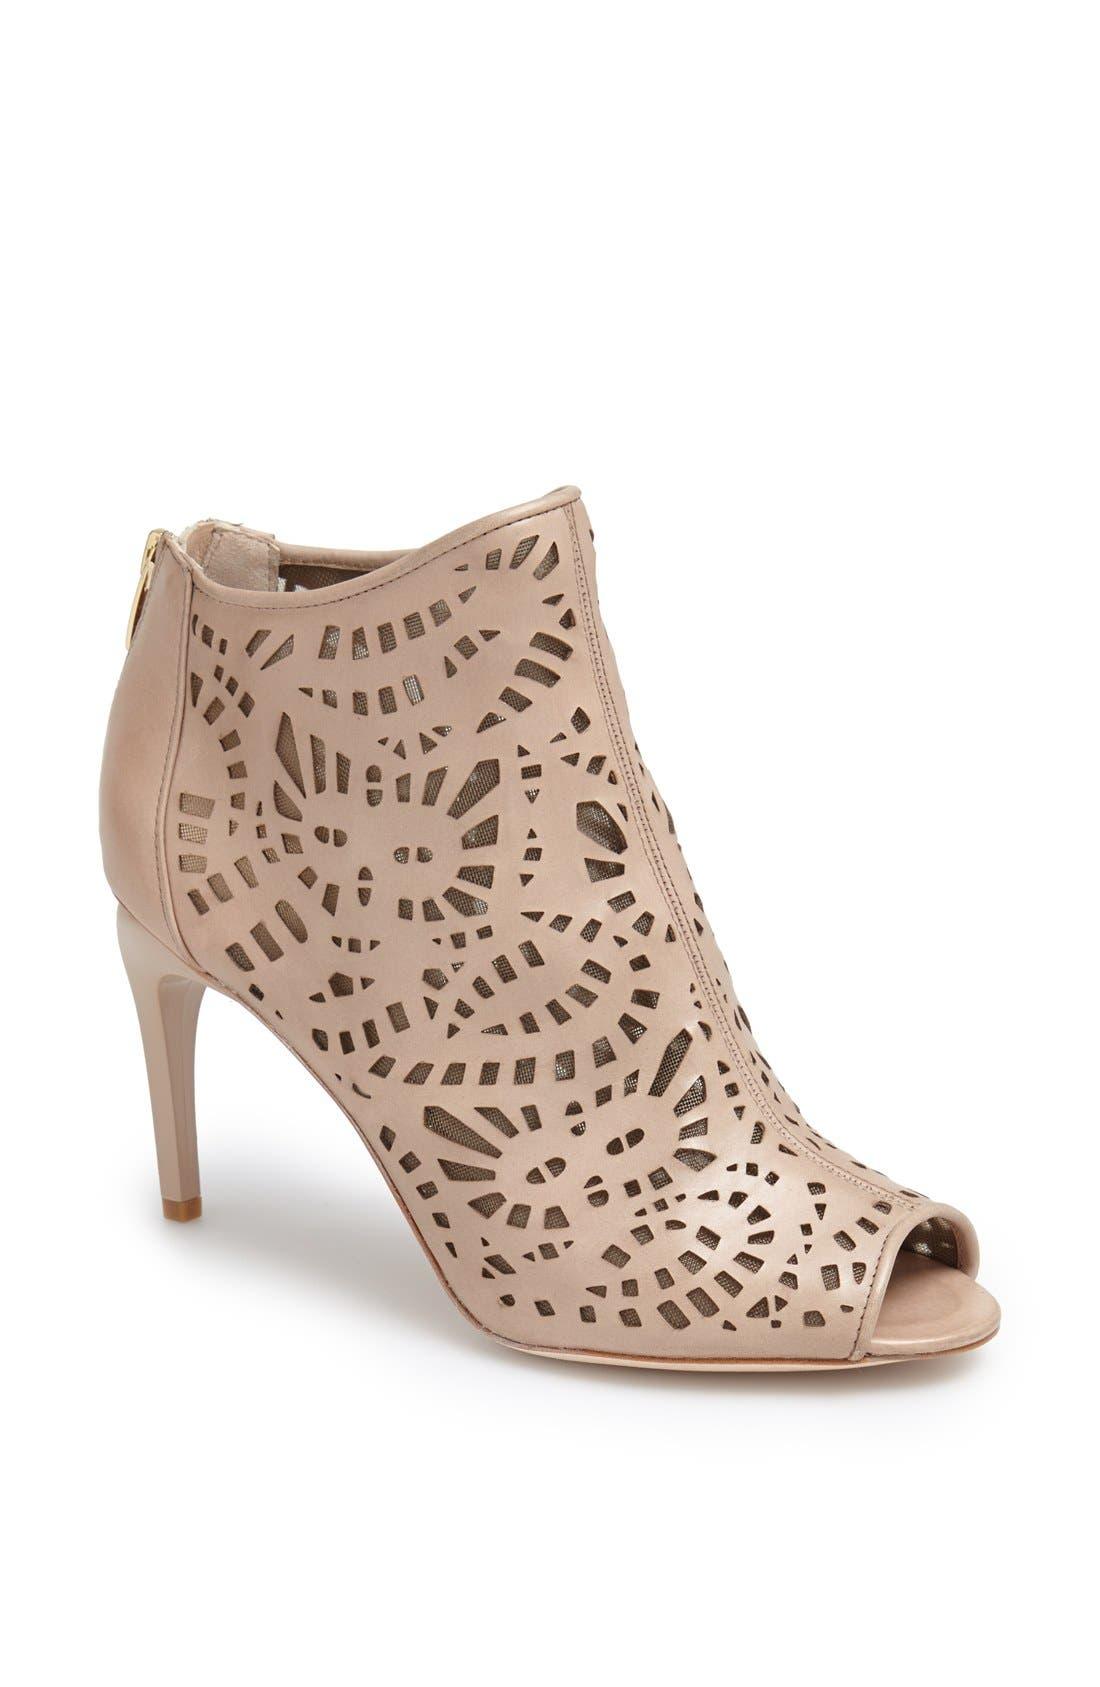 Main Image - Carolinna Espinosa 'Burbank' Geometric Cutout Leather Bootie